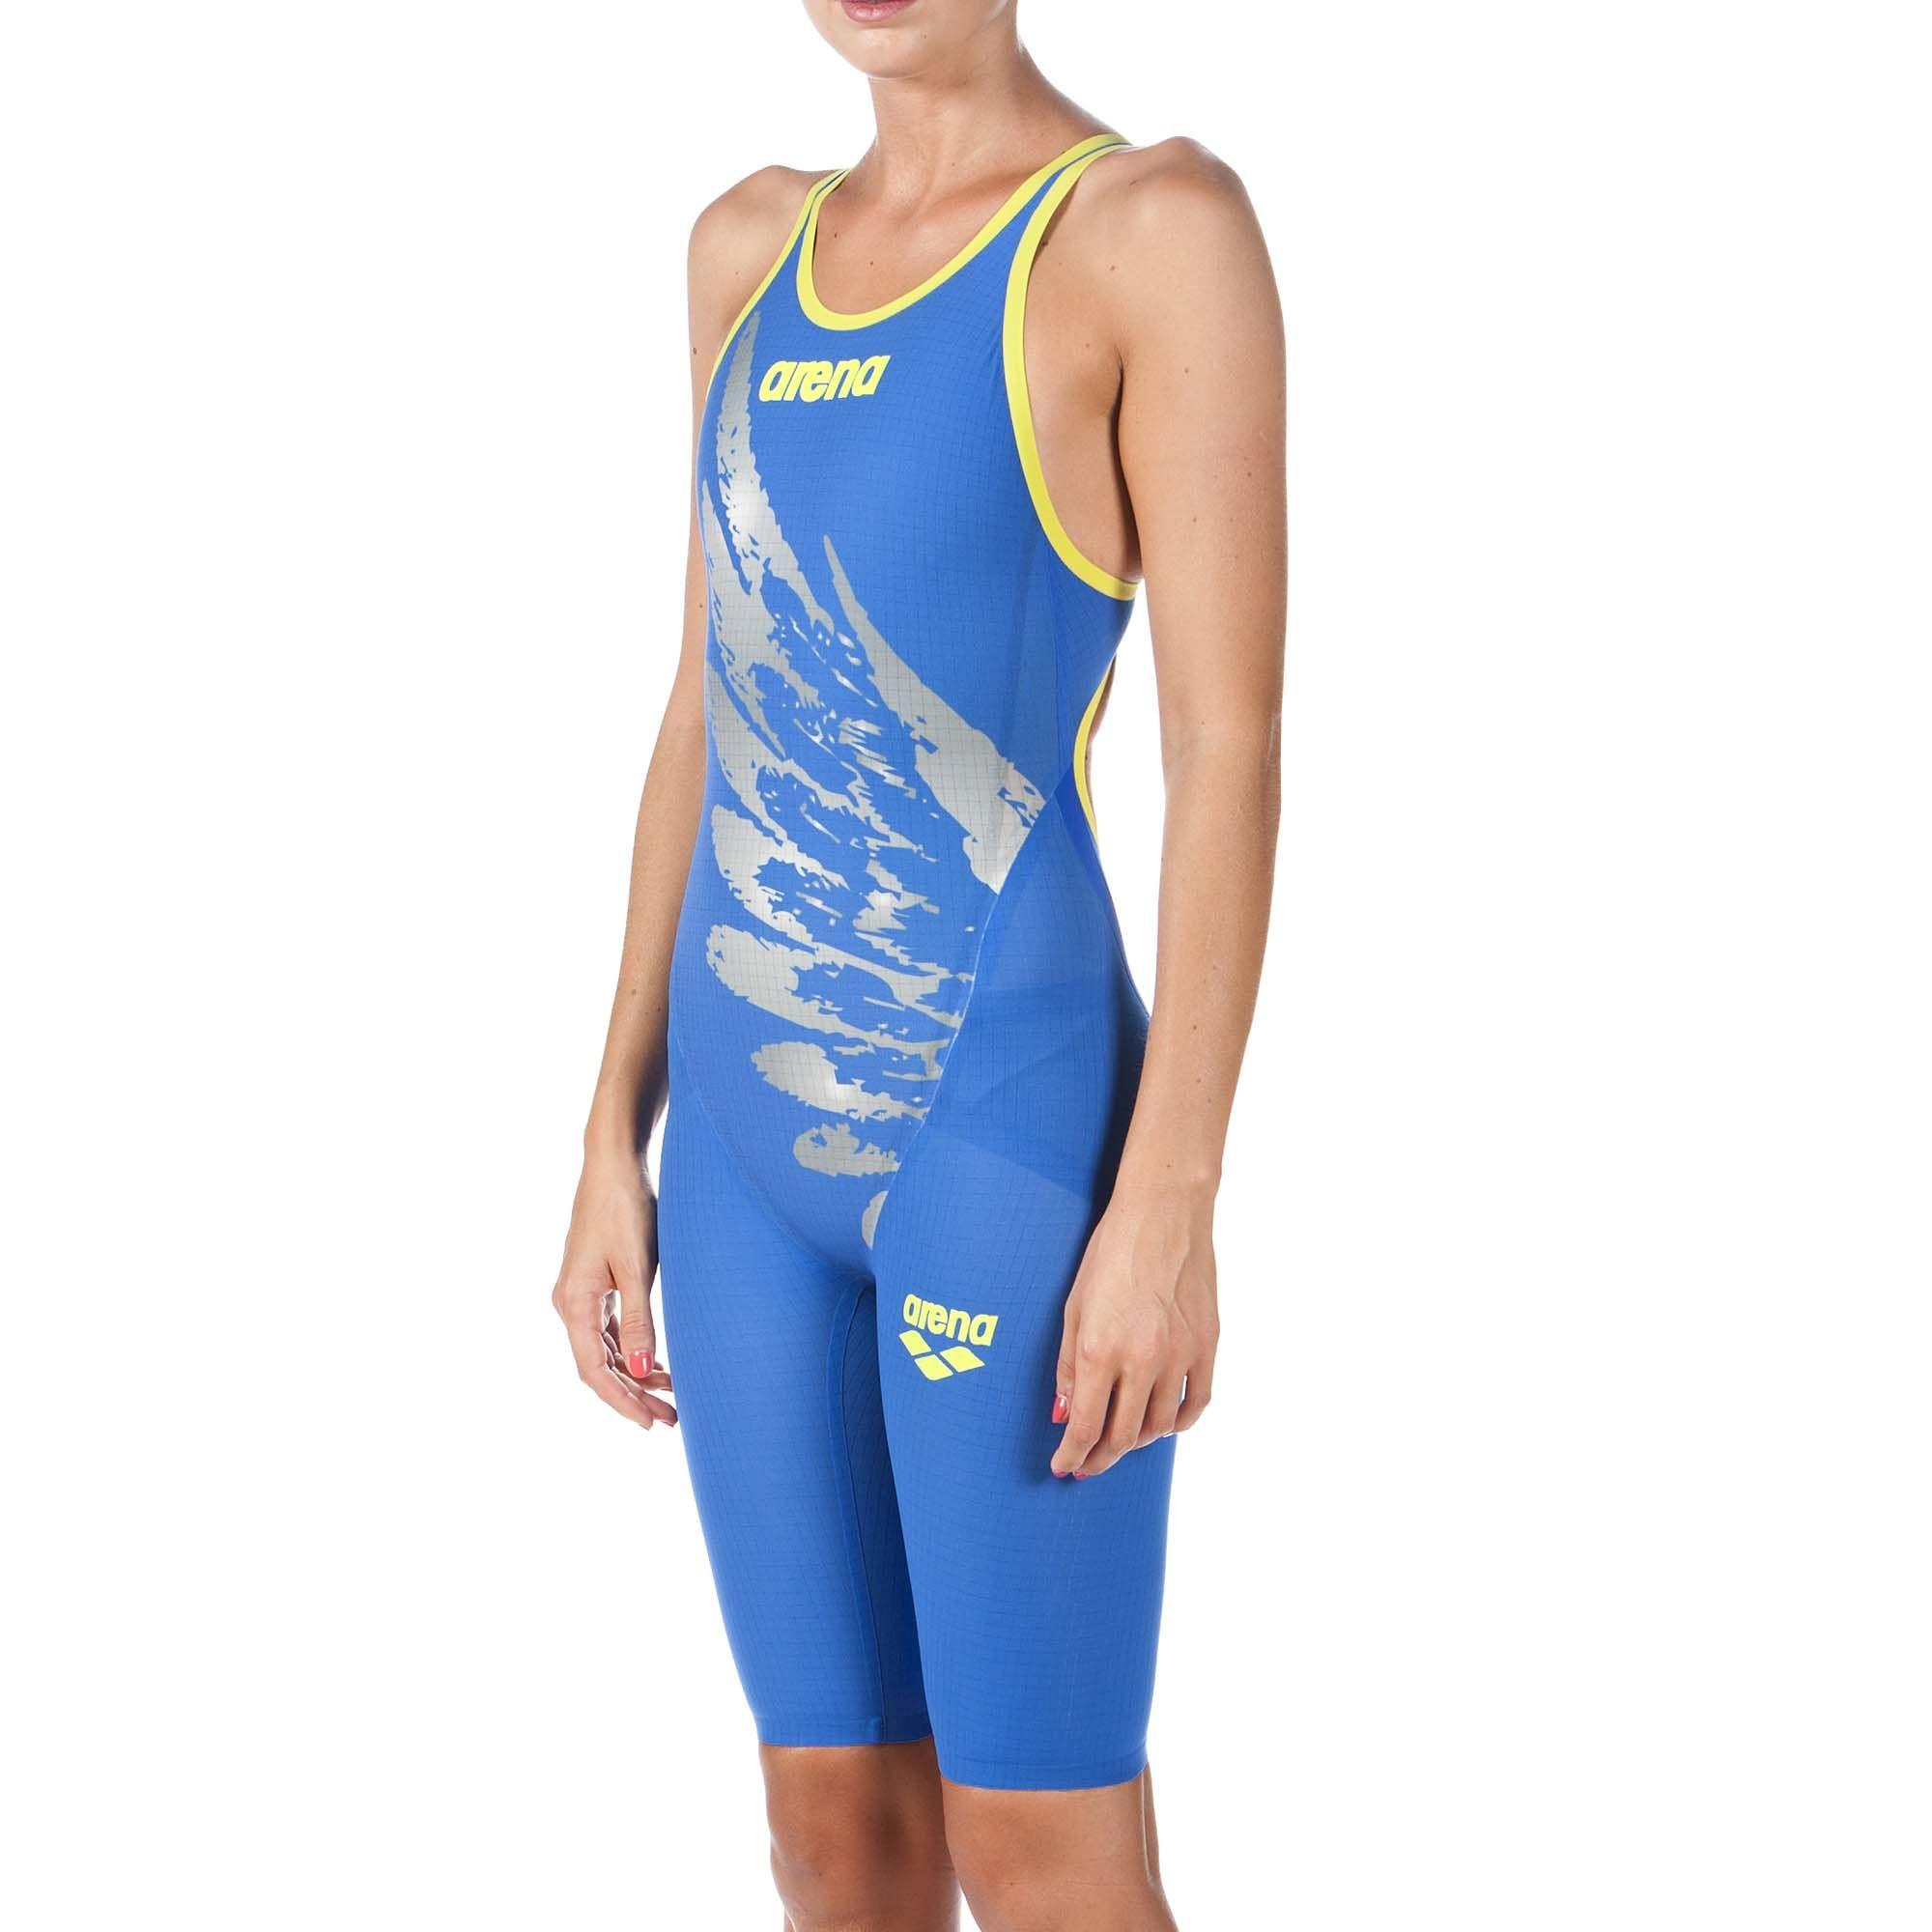 893742ad89e45 Carbon Flex VX Kneesuit - Arena Powerskin Carbon Flex - Competition  Swimwear - COMPETITION